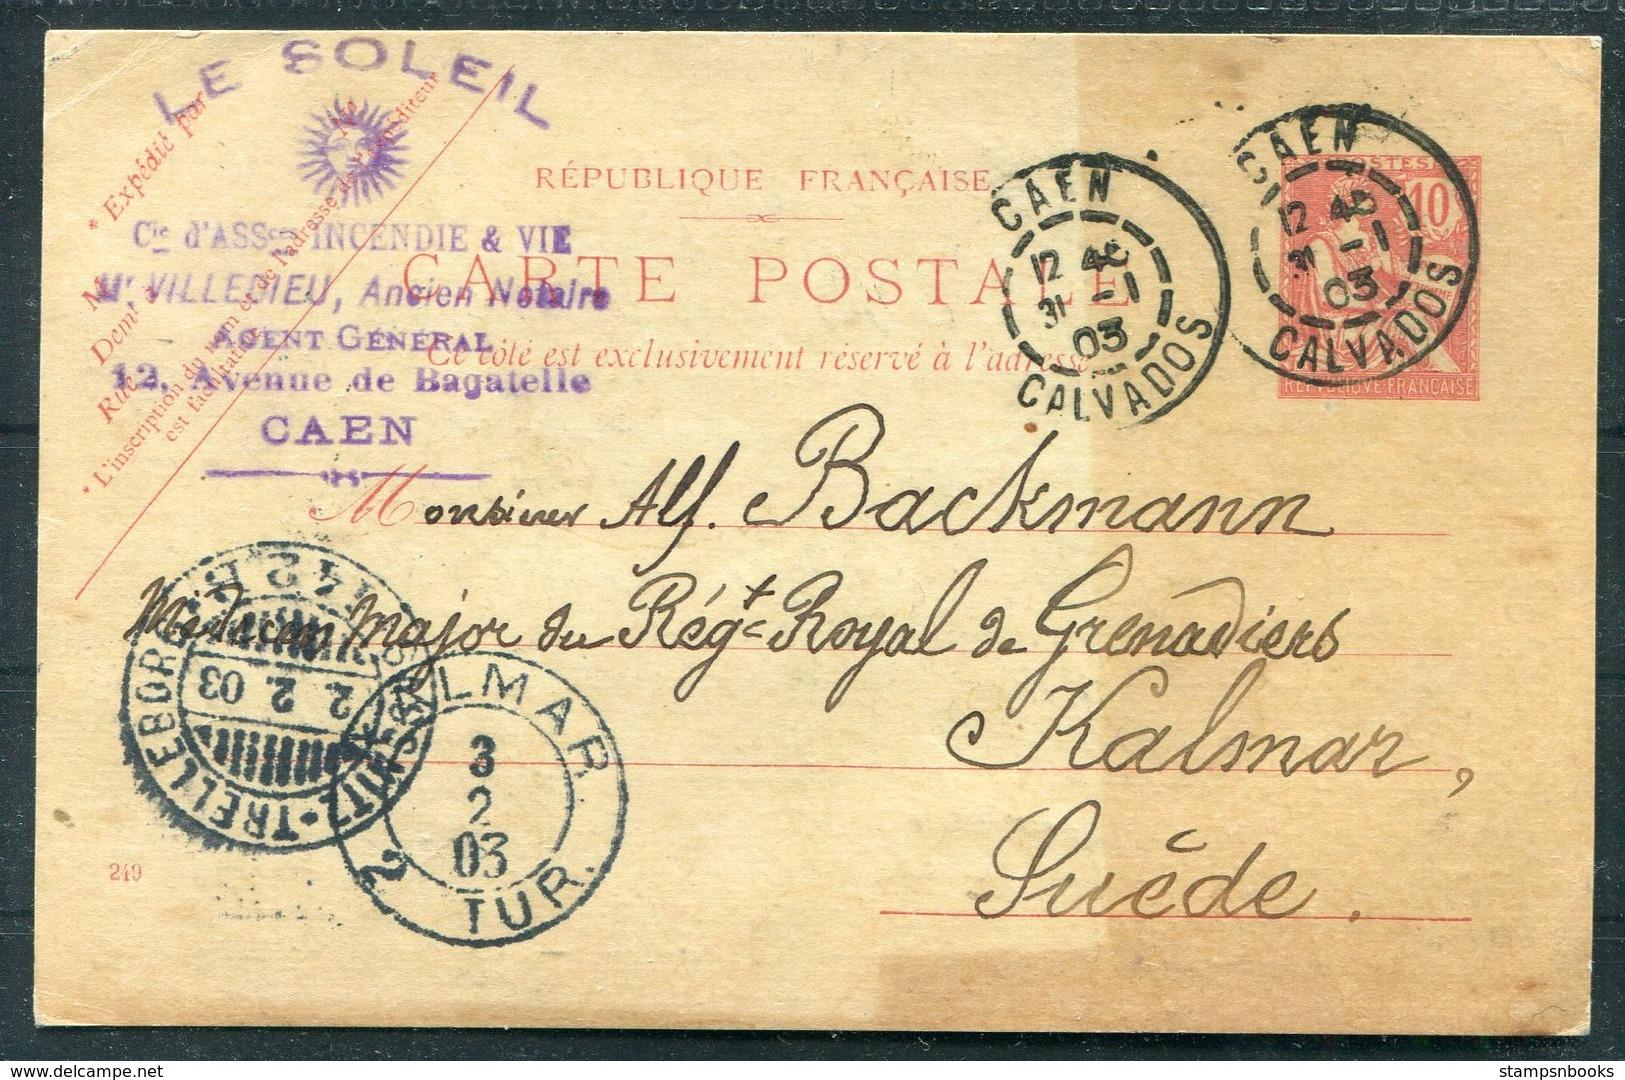 1903 Stationery Postcard, Le Soleil, Caen - Royal Grenadiers Military, Kalmar Sweden. Sassnitz / Trelleborg Ferry - Covers & Documents